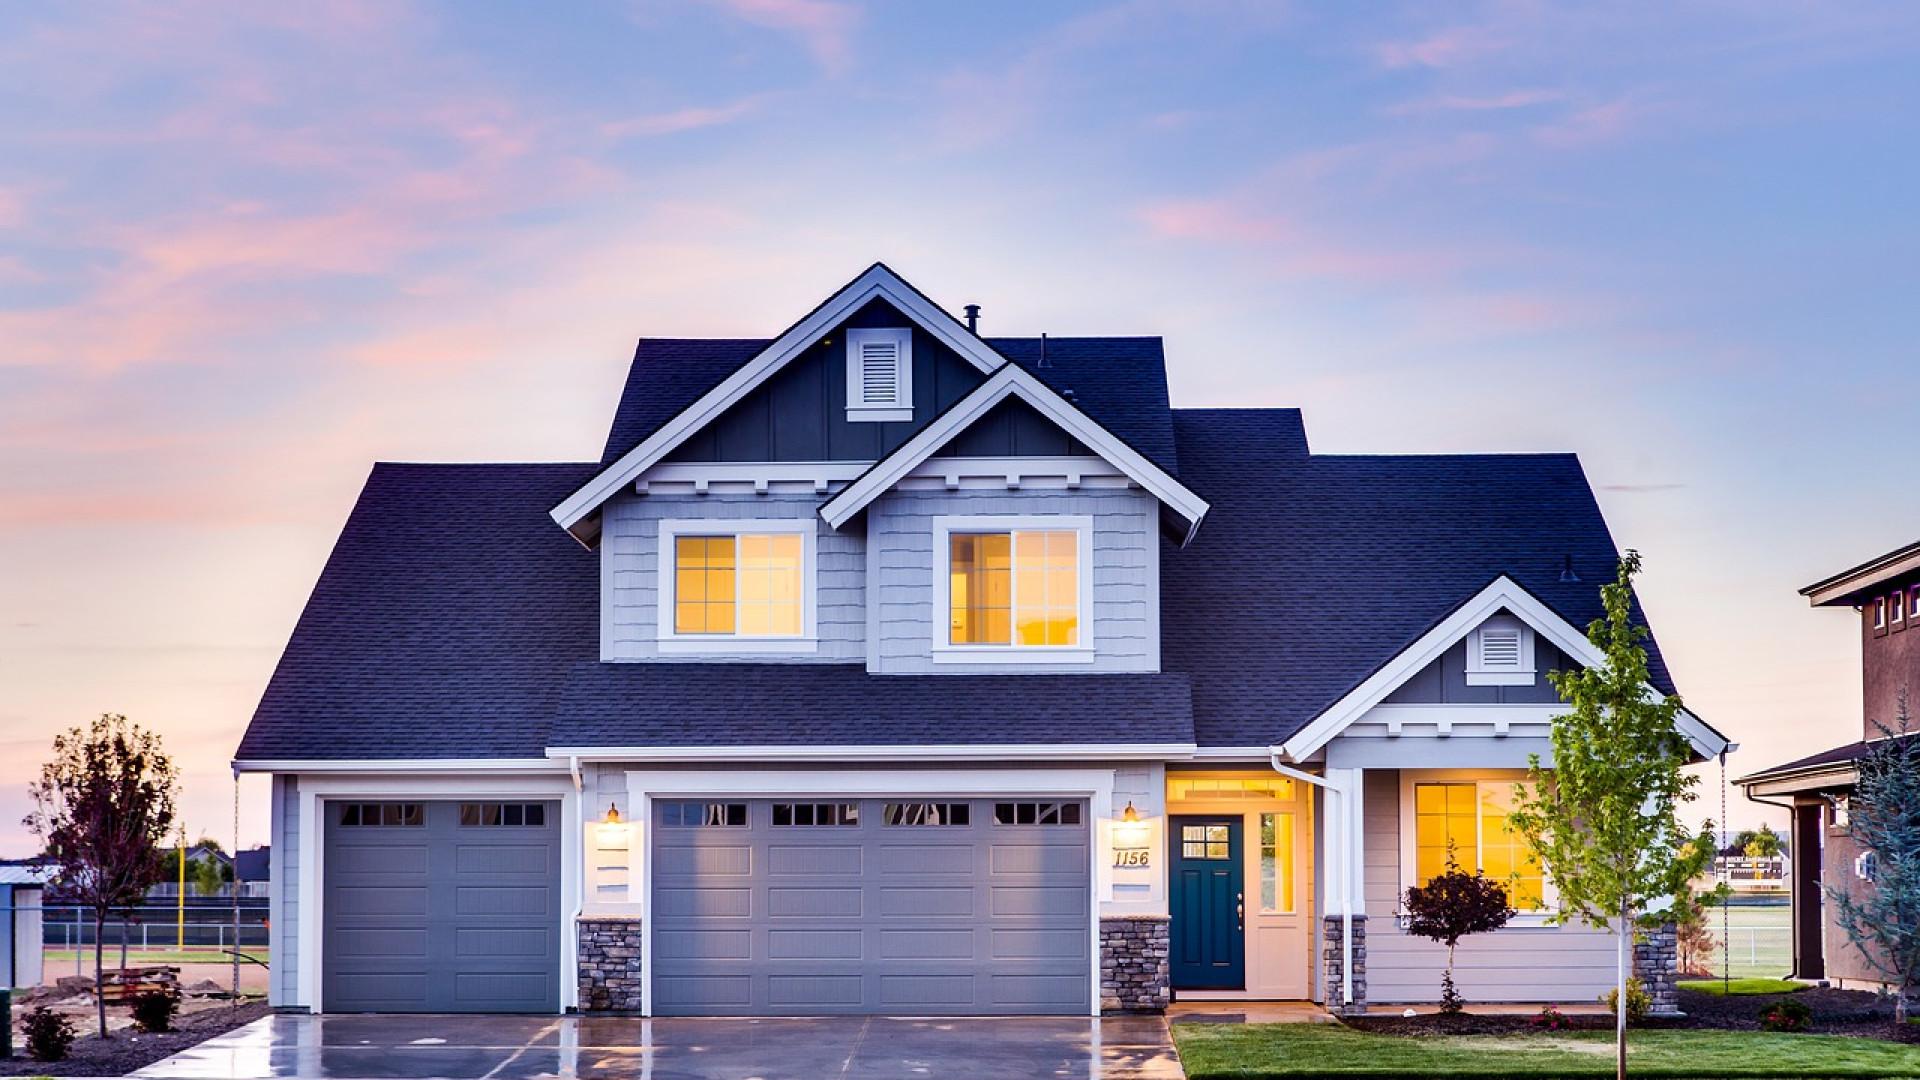 Combien coûte une porte de garage ?